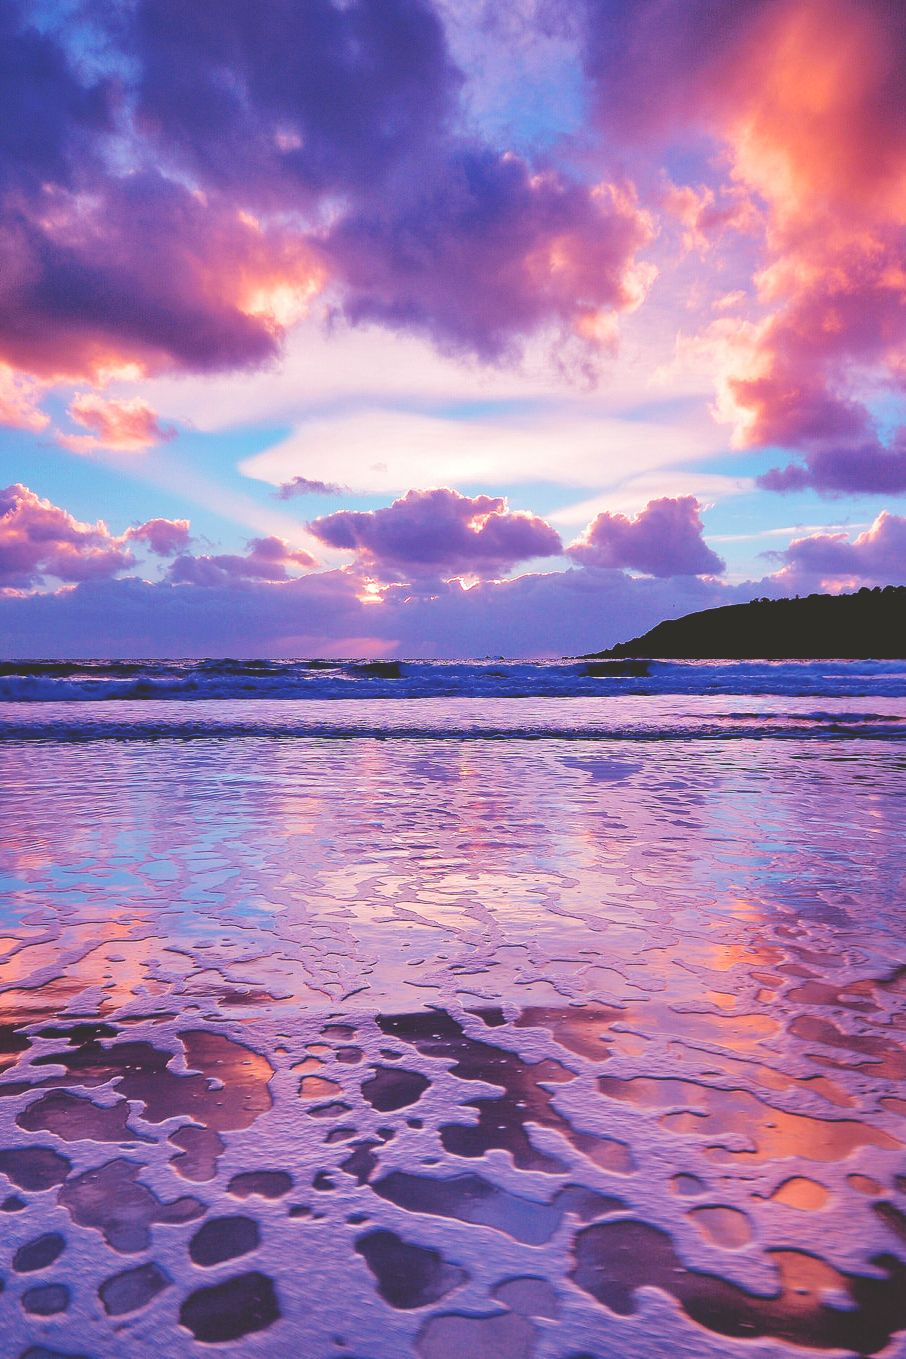 Fondos de pantalla de paisajes bonitos